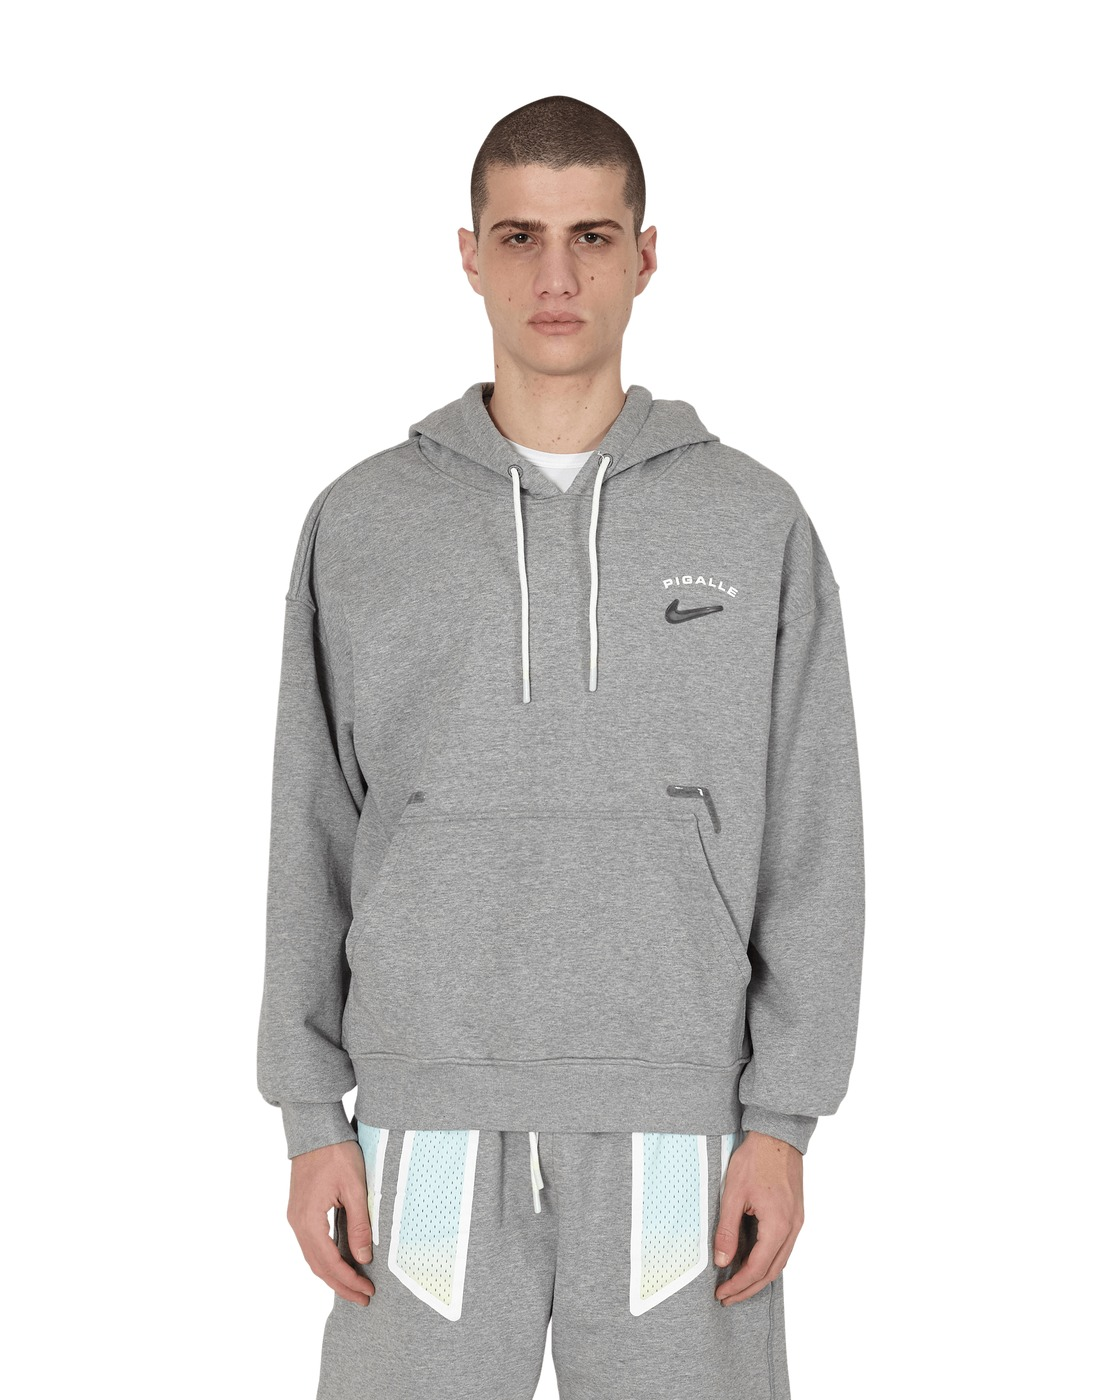 Nike Special Project Pigalle Hooded Sweatshirt Dk Grey Heather